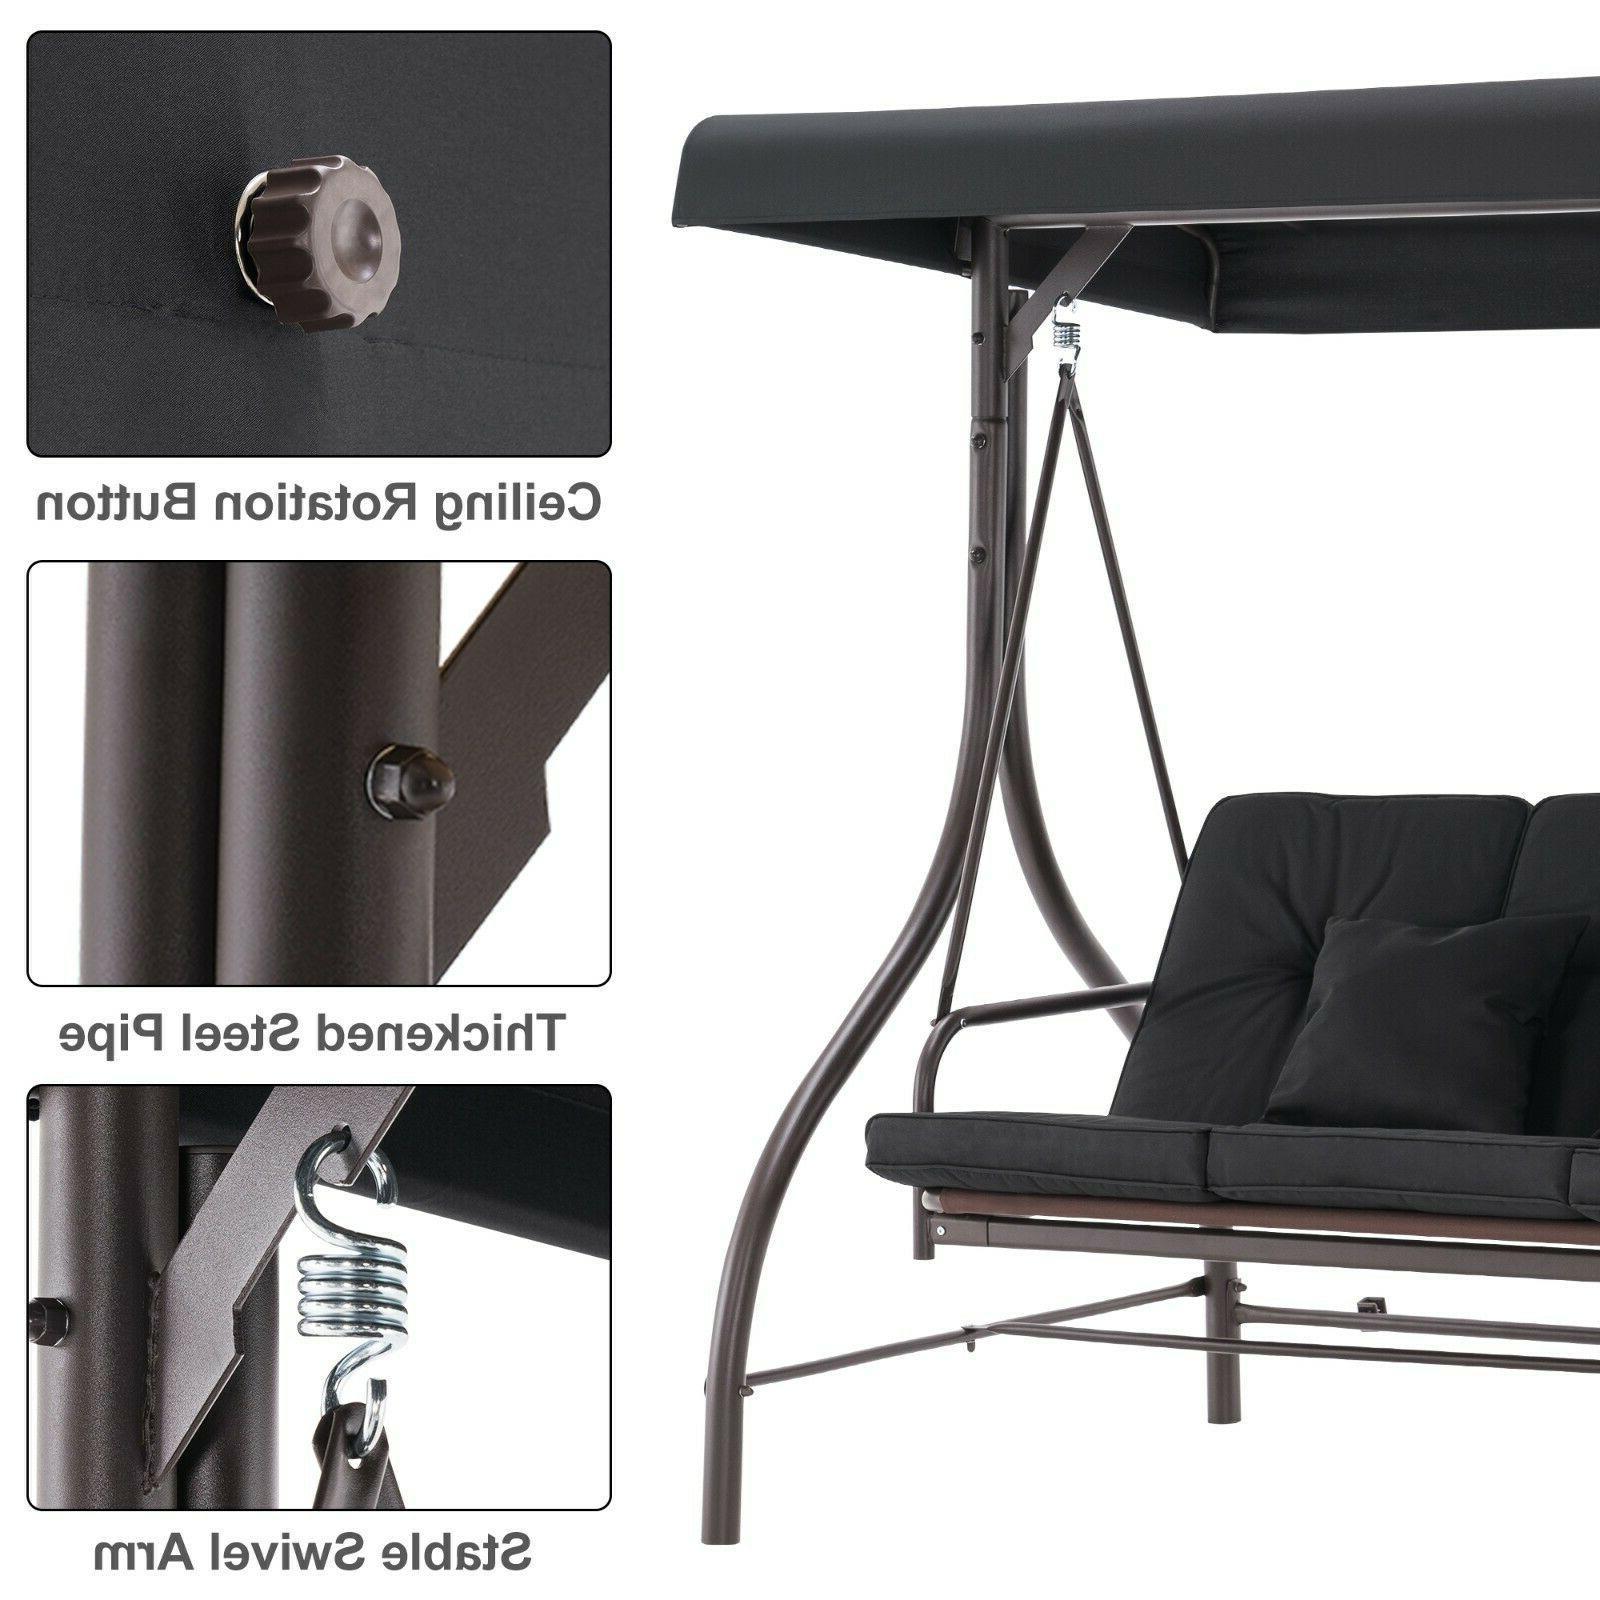 MCombo Outdoor Patio Swing Chair, Swing Glider